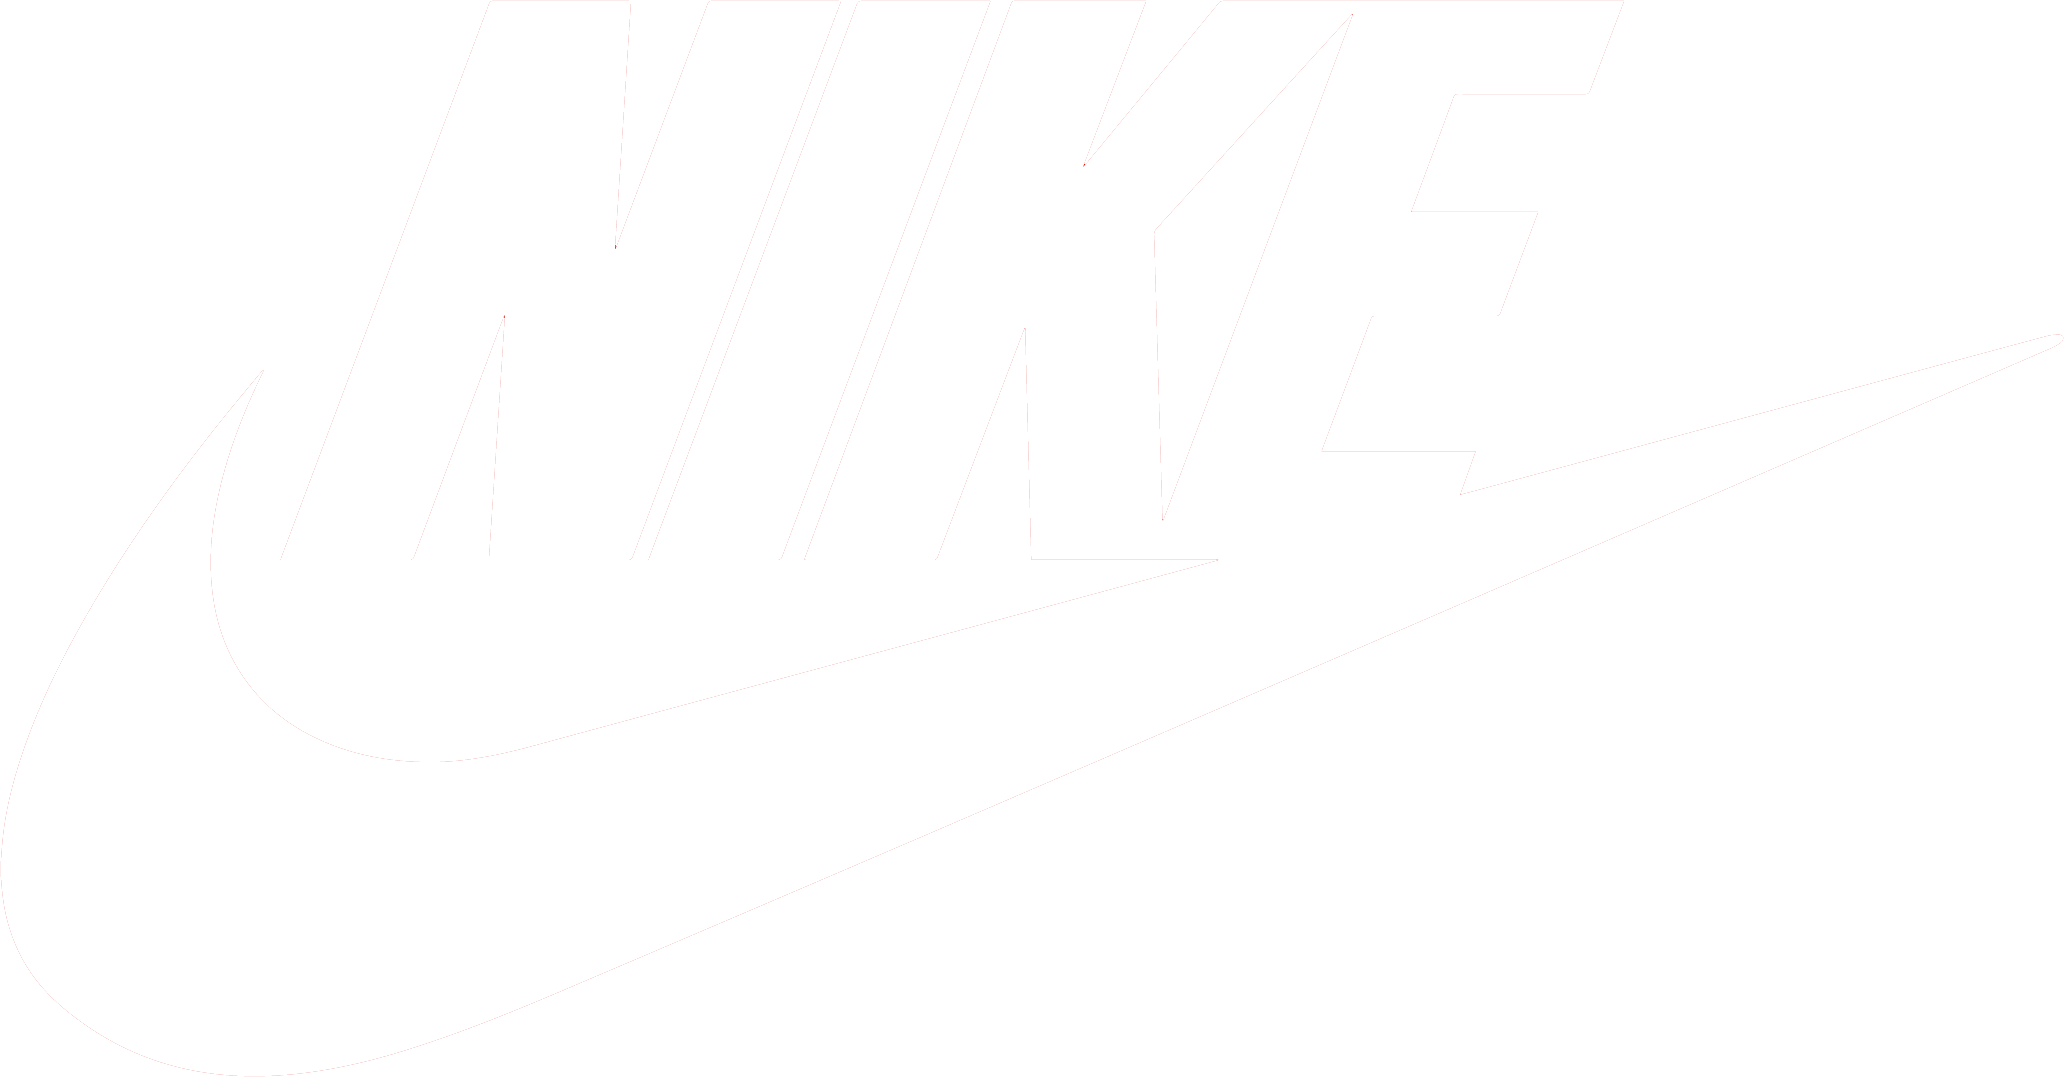 nike logo png transparent nike logo png images pluspng rh pluspng com nike logo png black nike logo png image